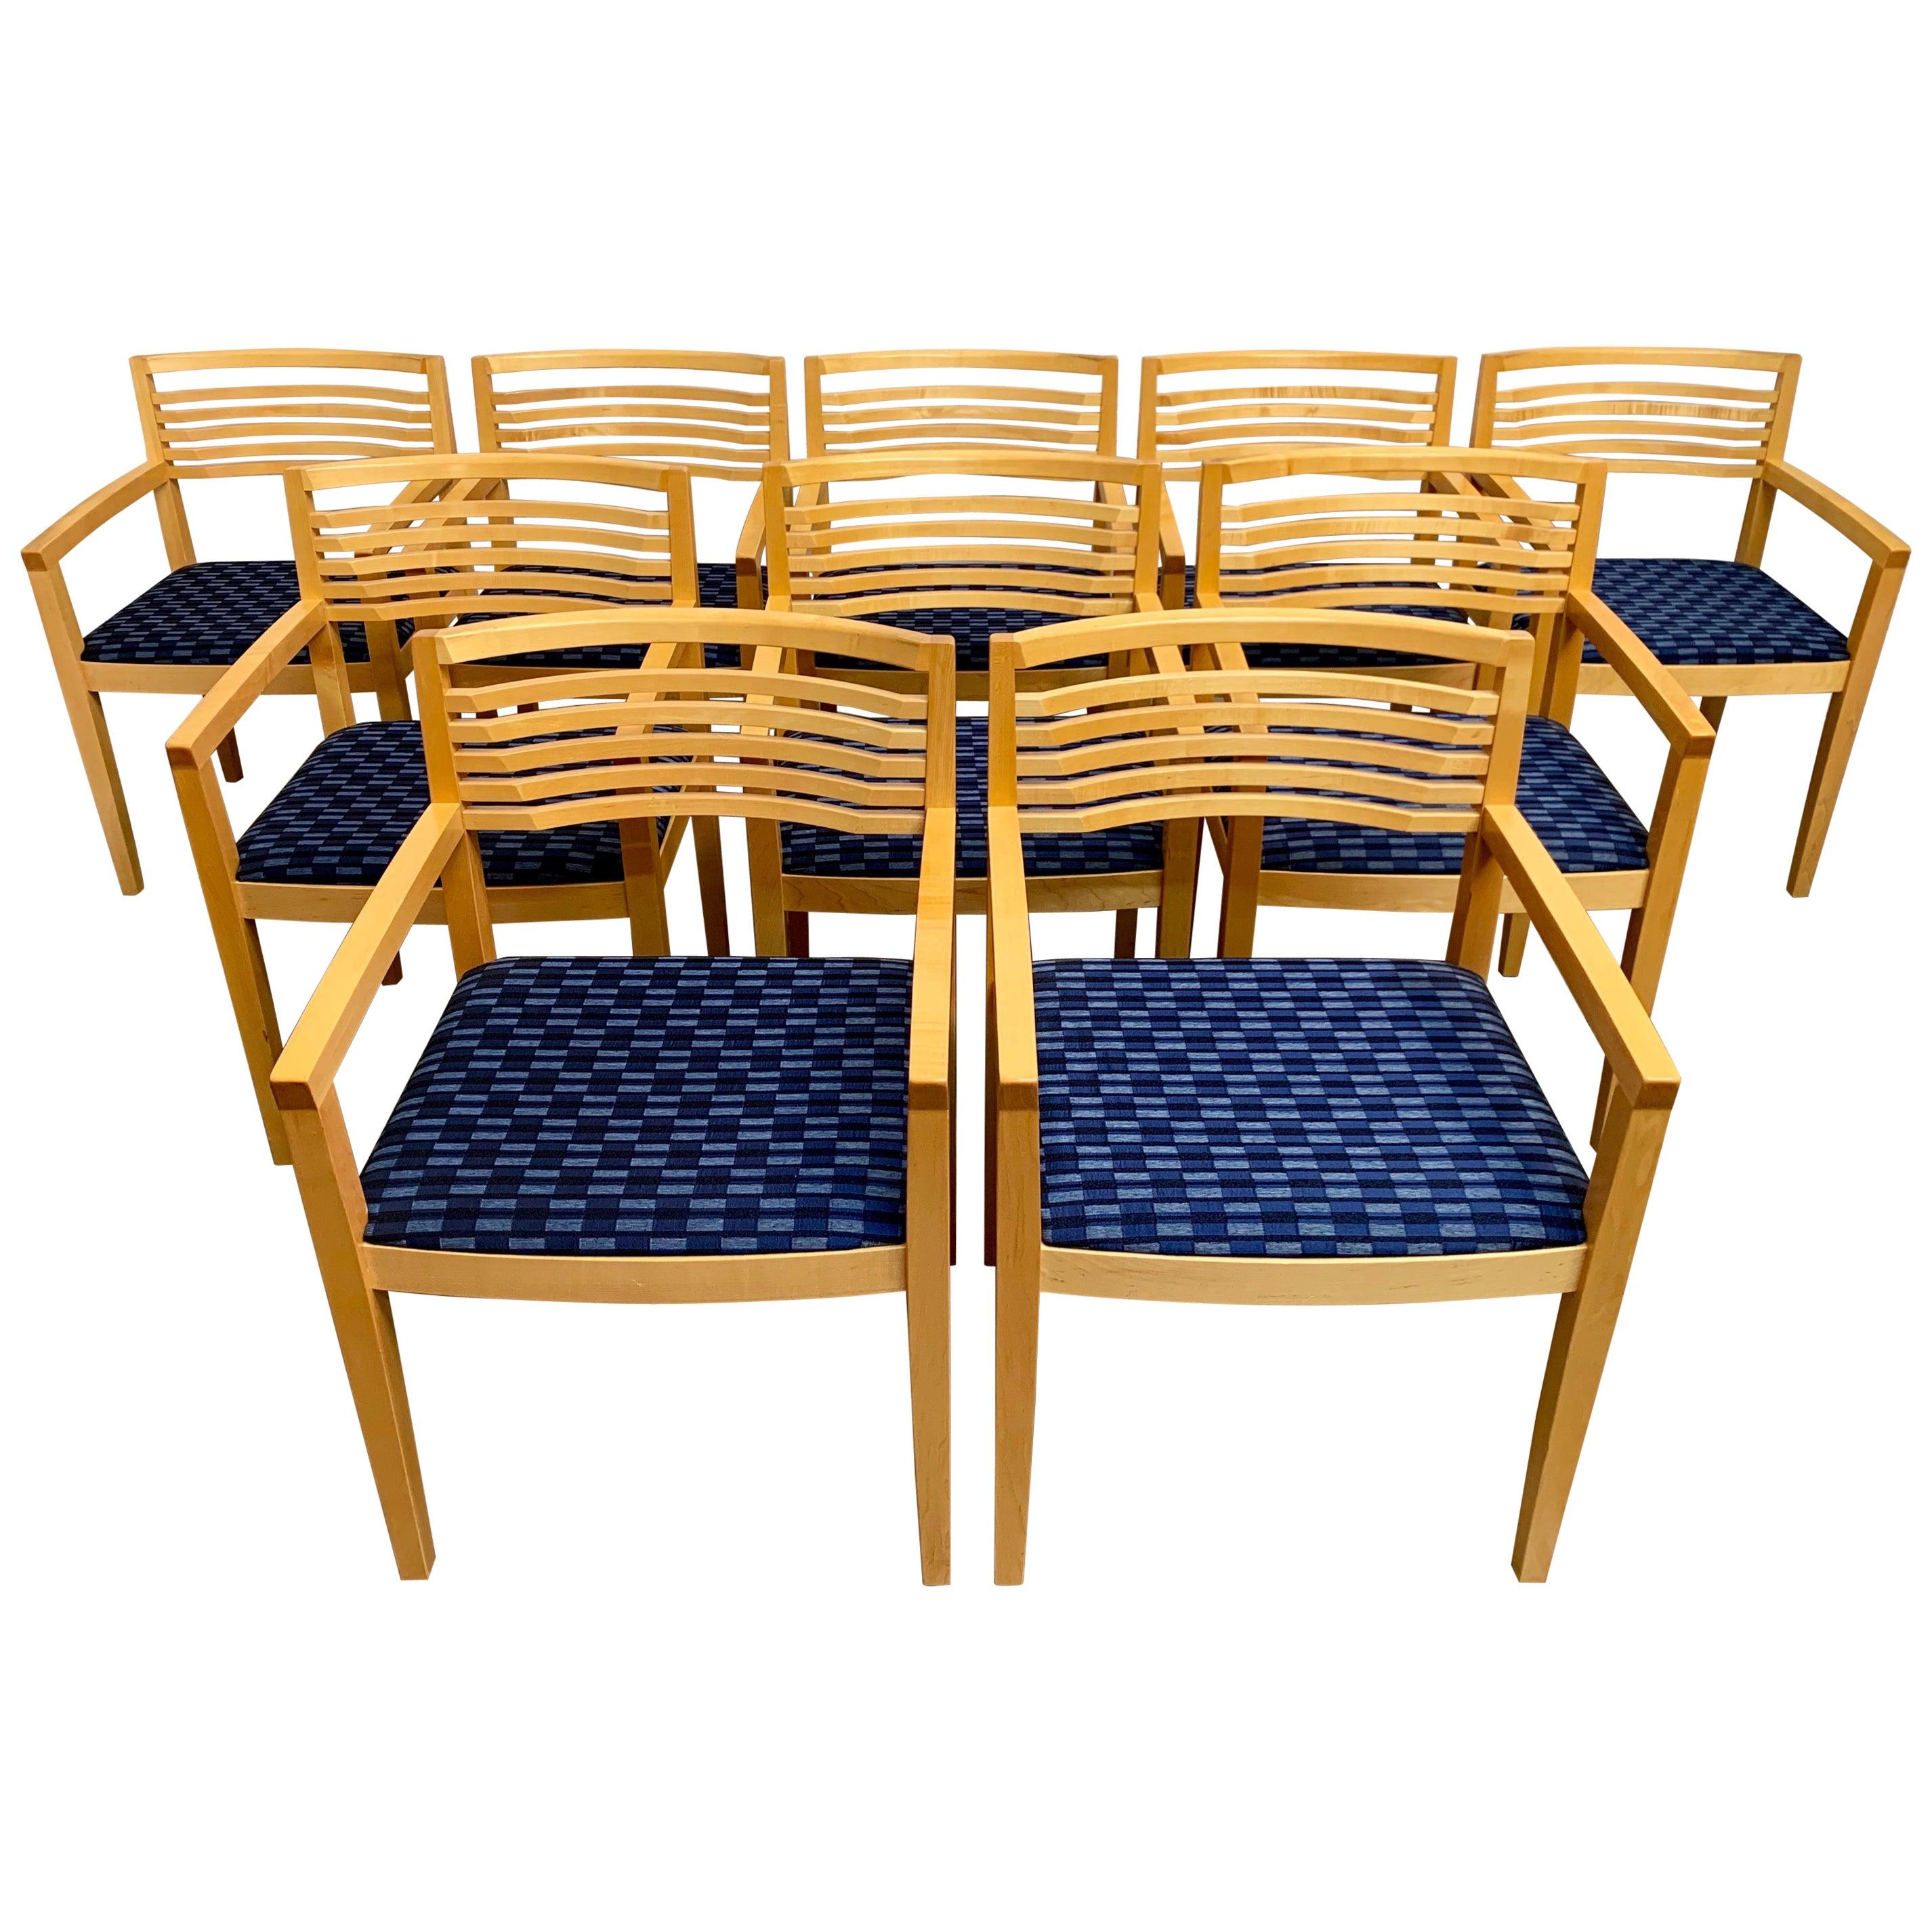 Set of Ten Knoll Studio Ricchio Chairs